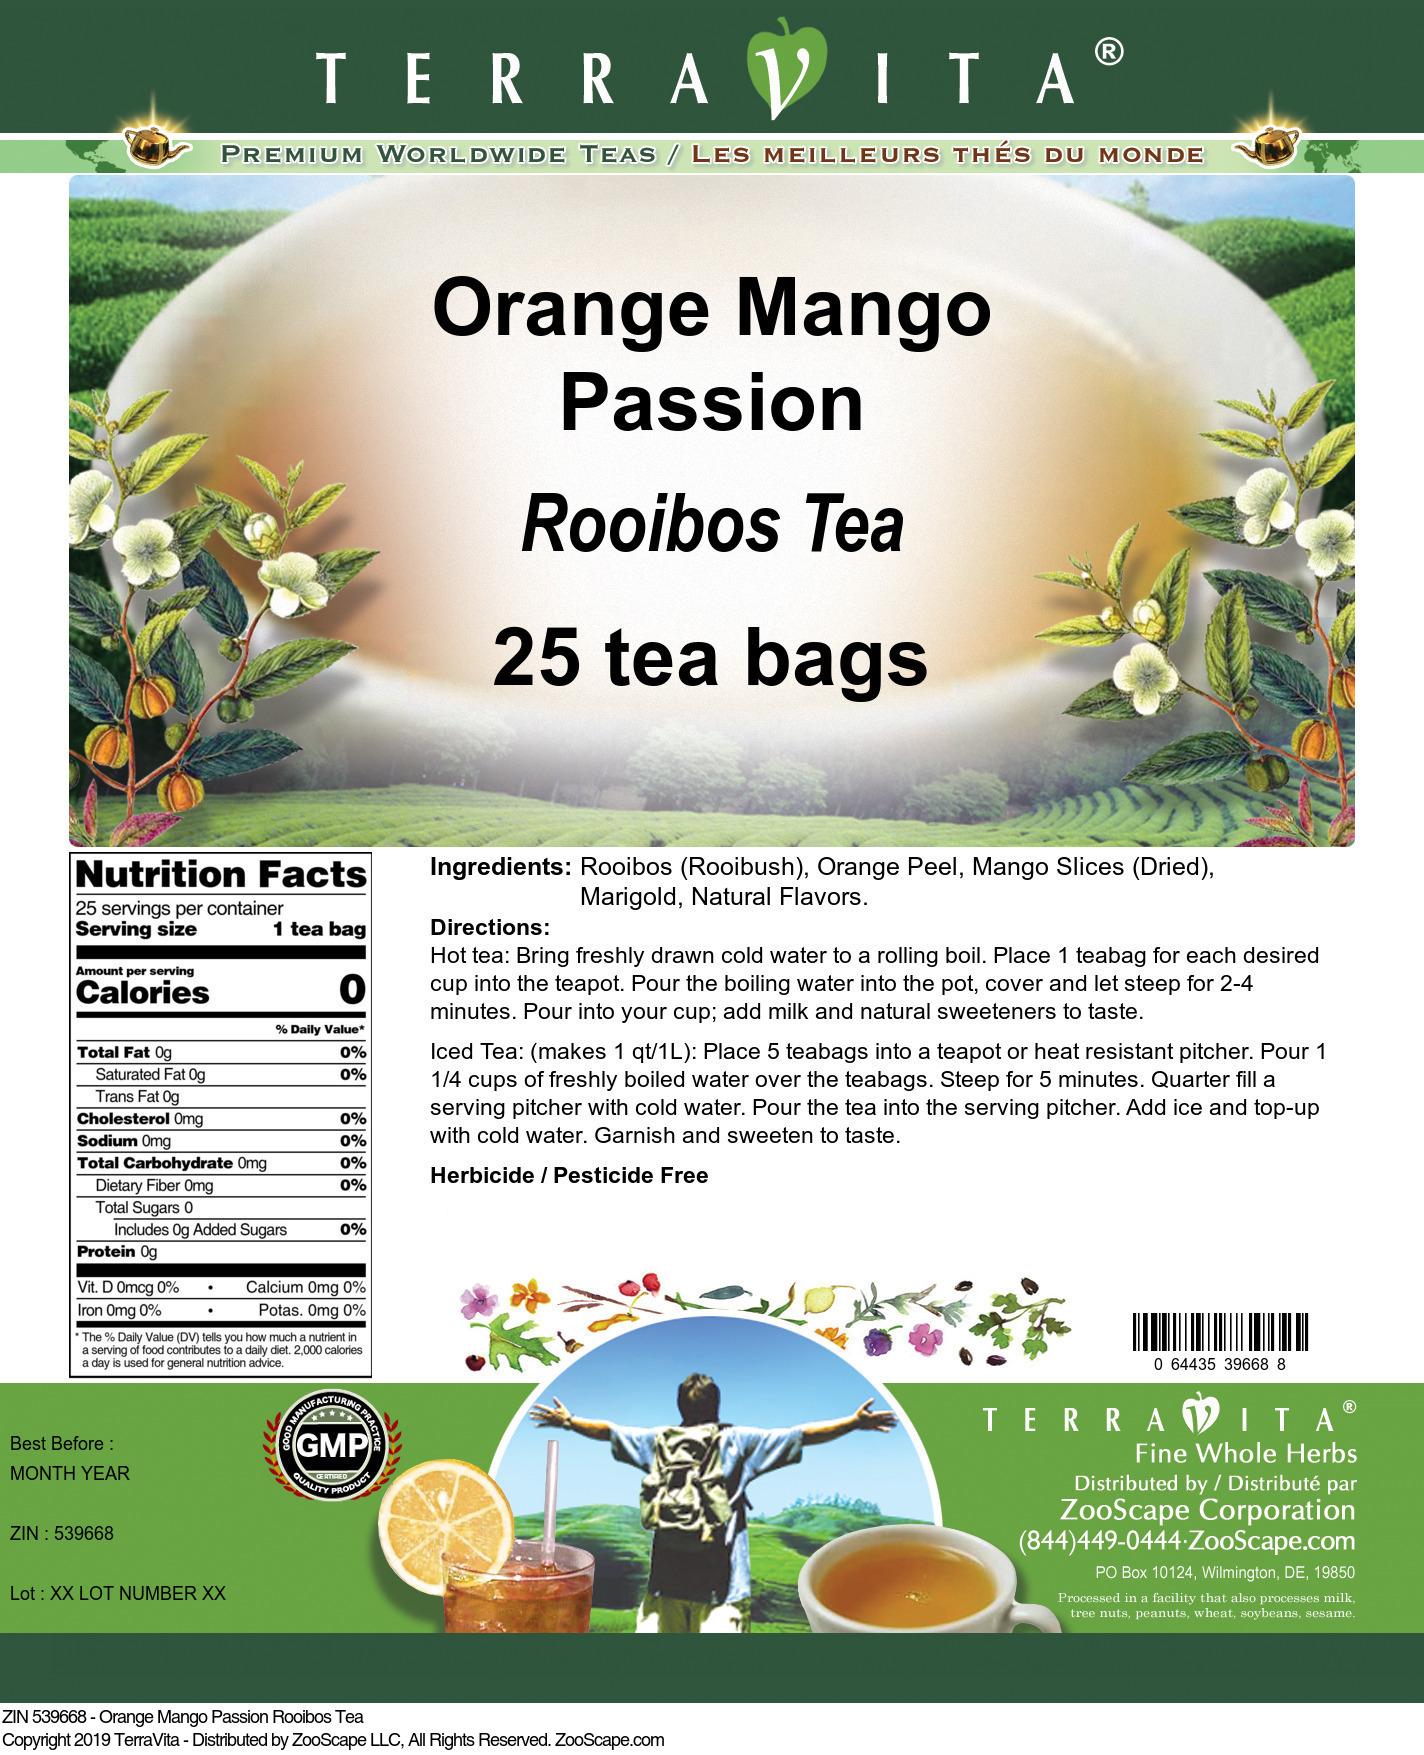 Orange Mango Passion Rooibos Tea